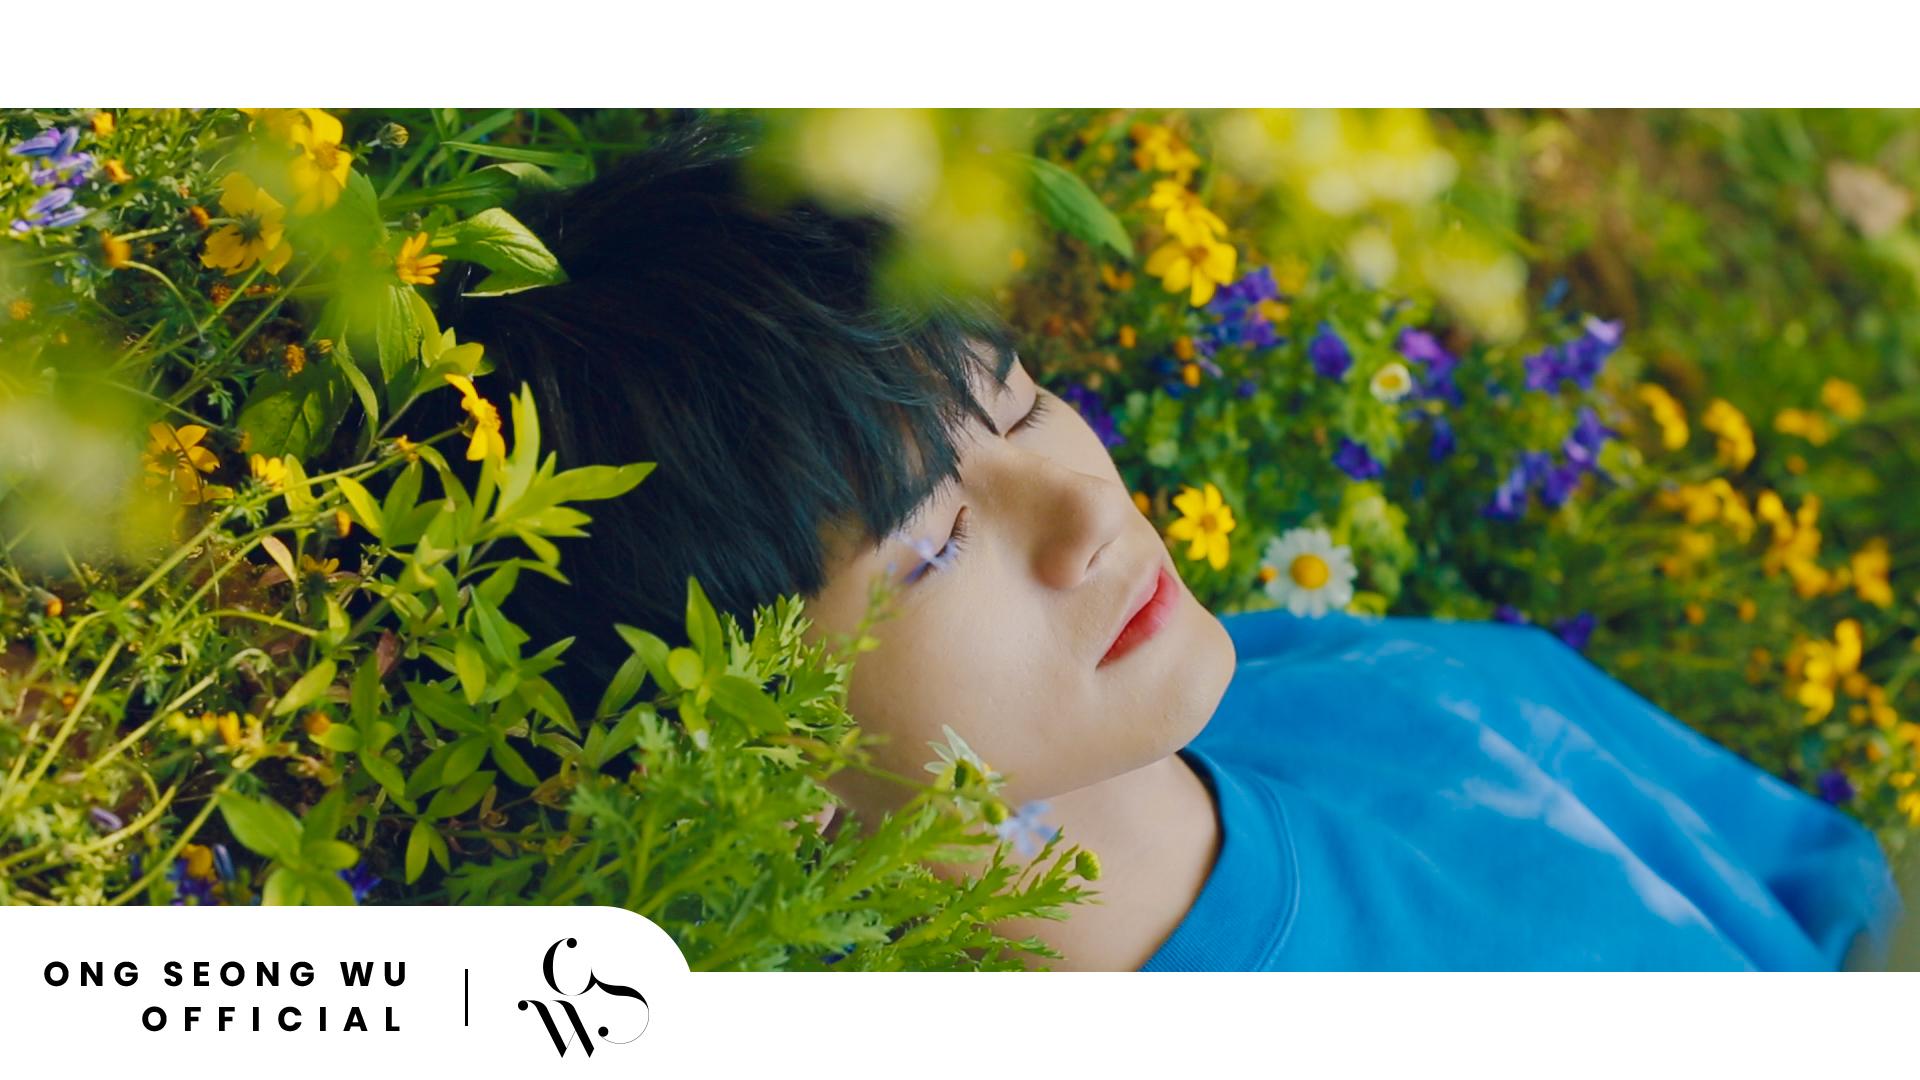 ONG SEONG WU 옹성우 - '열여덟의 순간' 포스터 촬영장